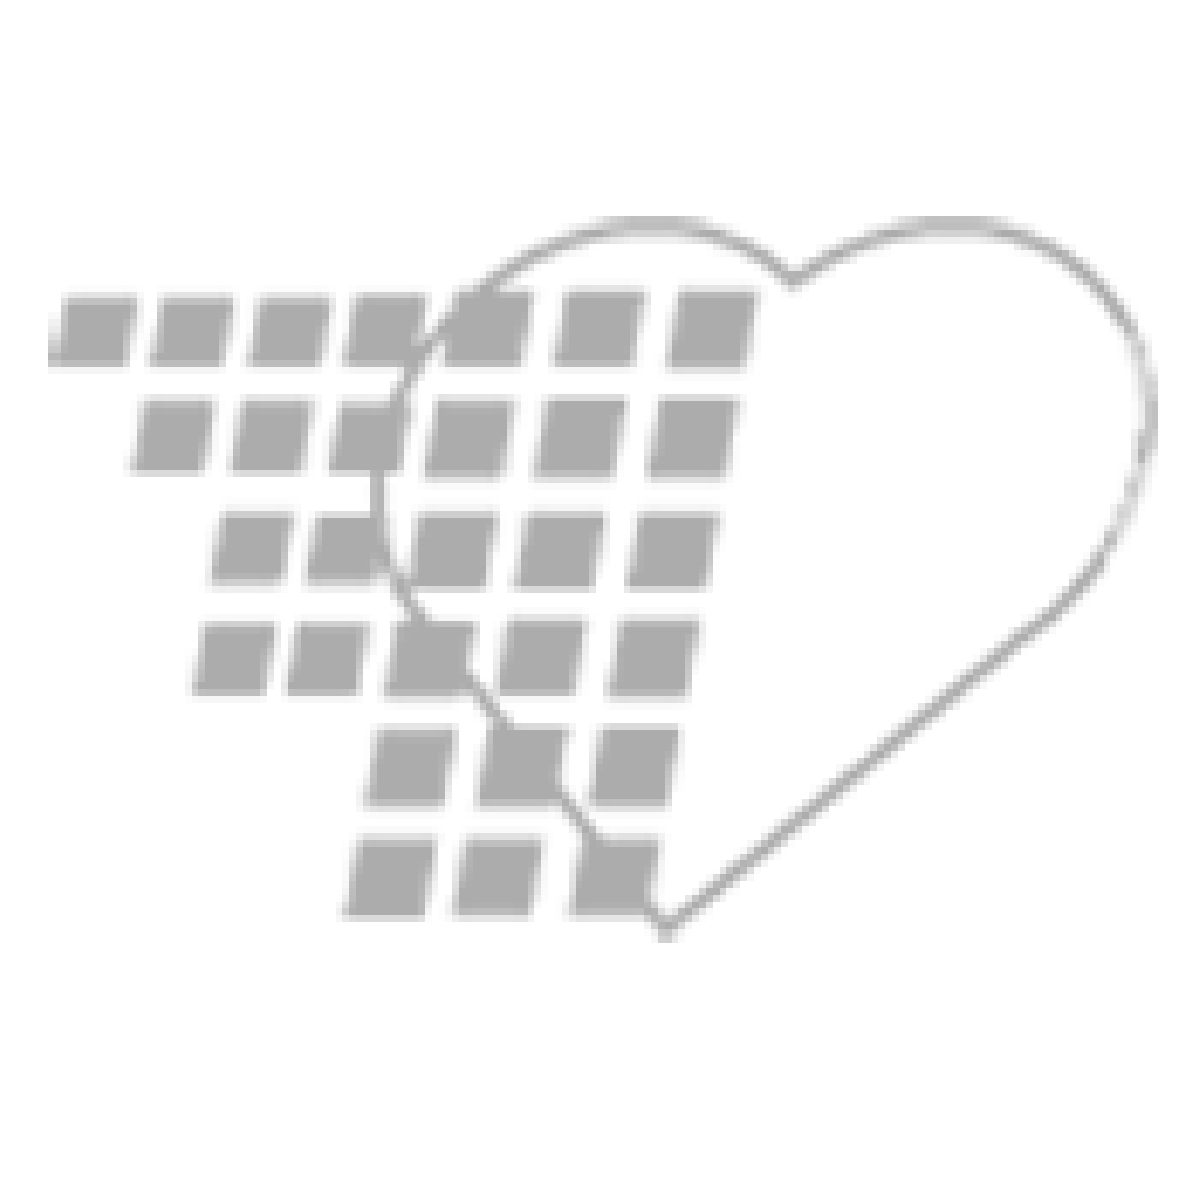 02-70-4001 Laryngoscope Blade, Disposable Fiber Optic